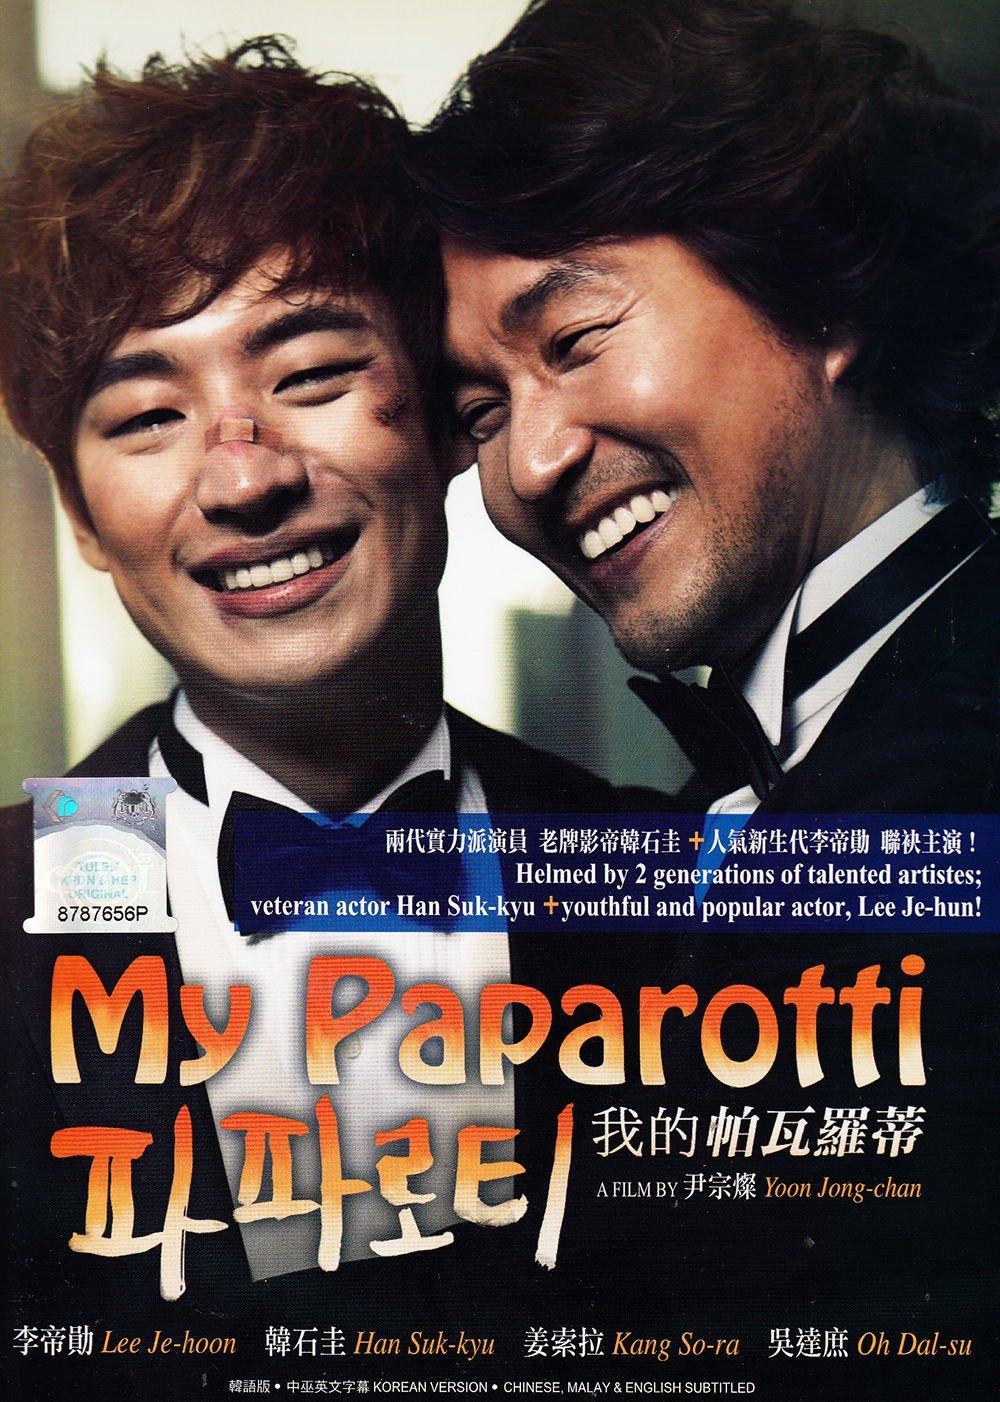 My paparotti 2013 파파로티 720p download movie english subtitle.